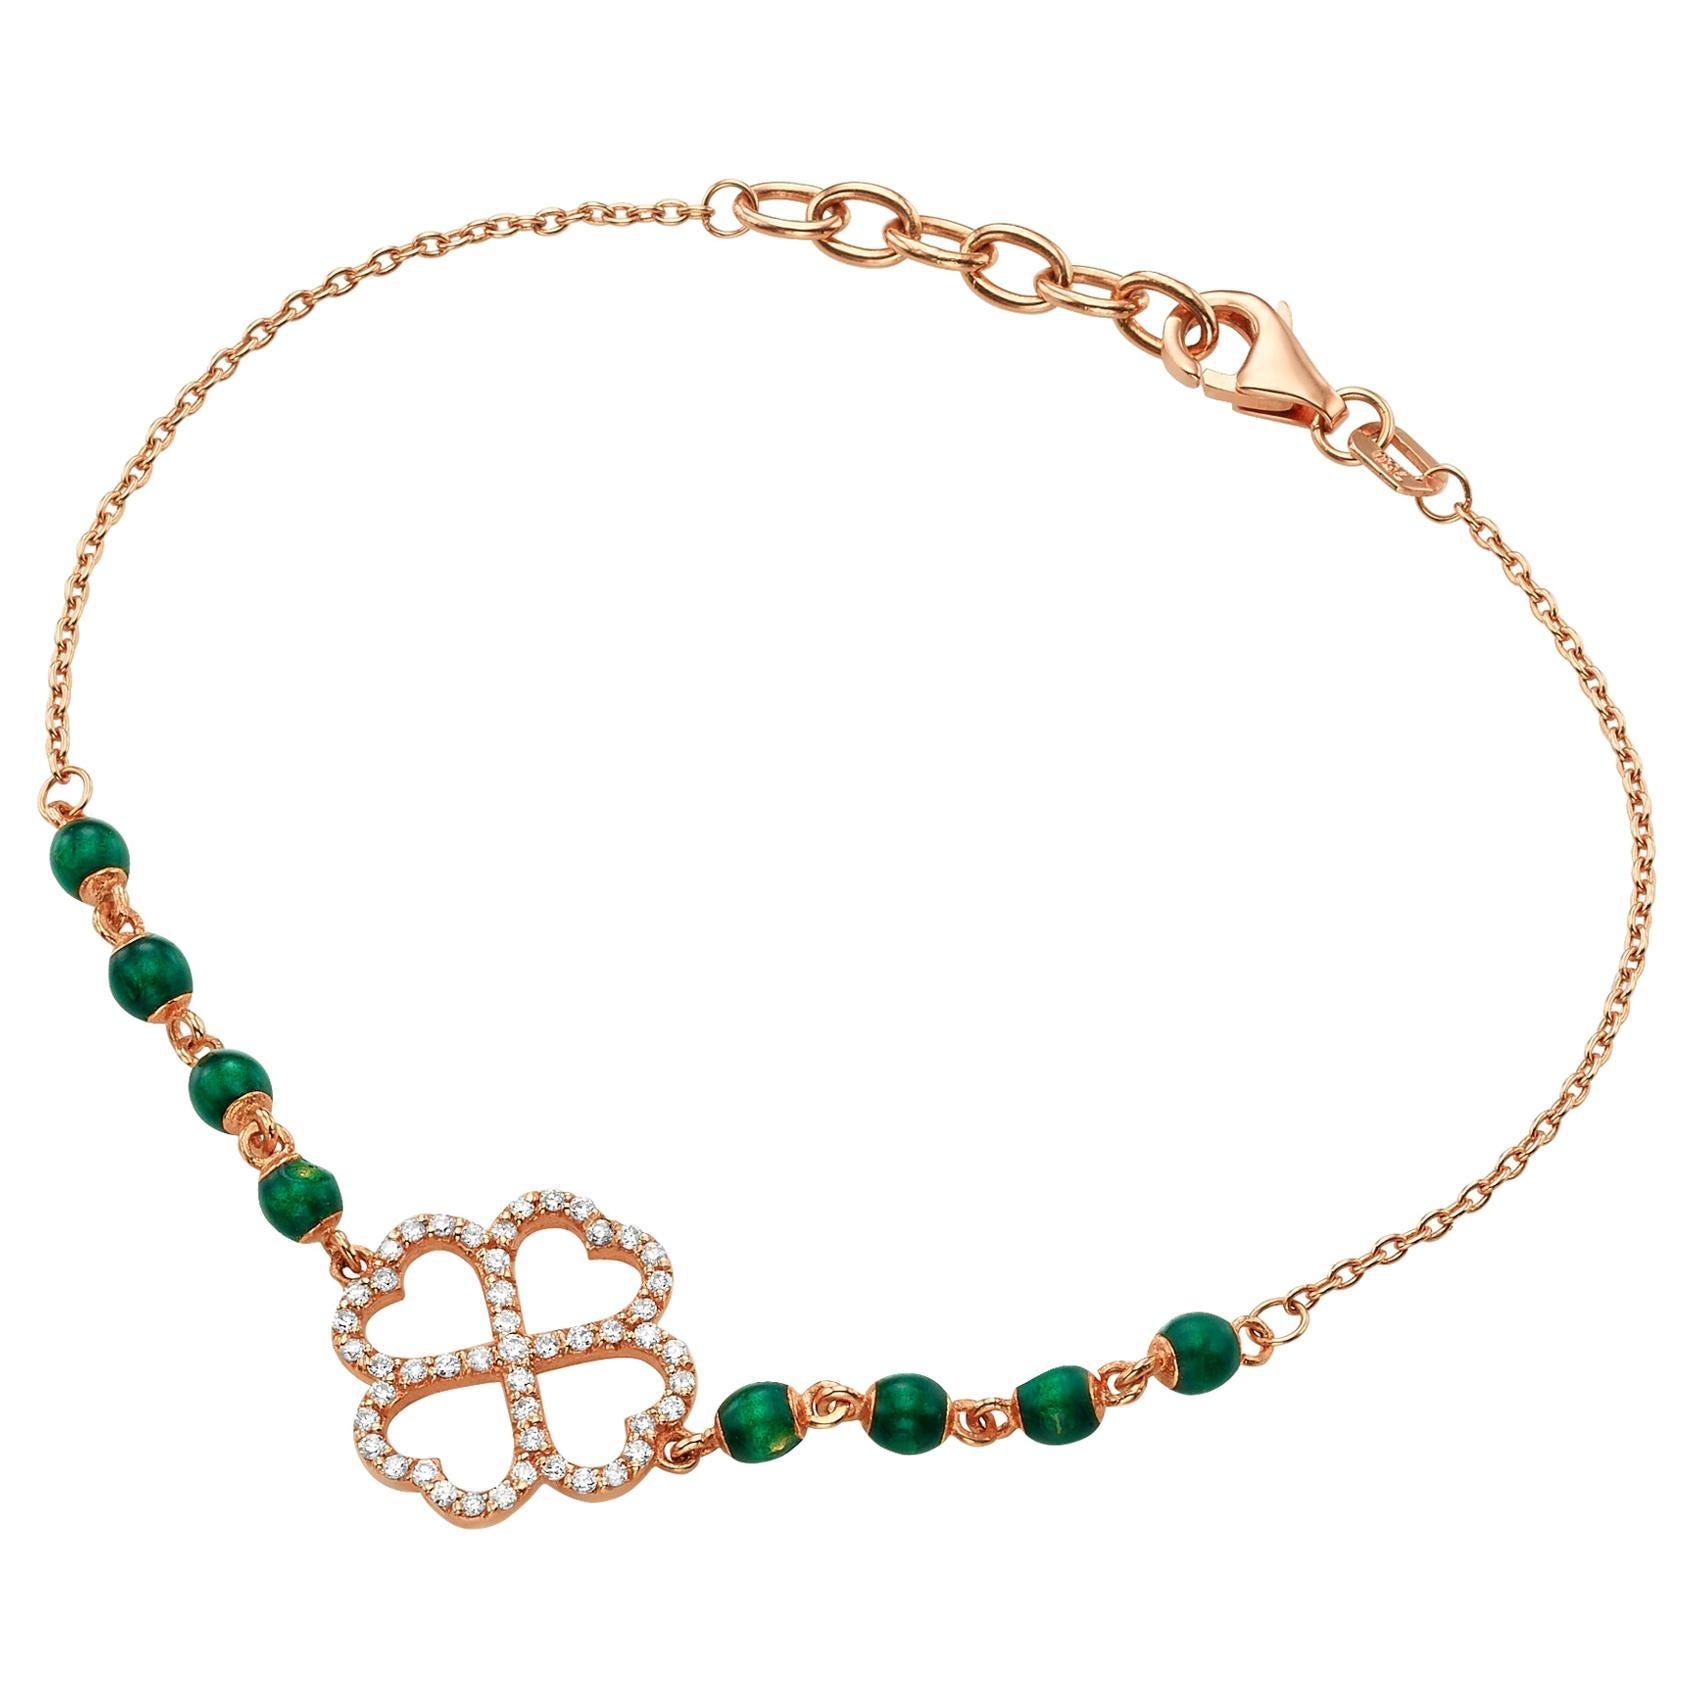 Flower Shaped Diamond Beaded Charm Bracelet 0.18 Carat 18K Gold Diamond Bracelet